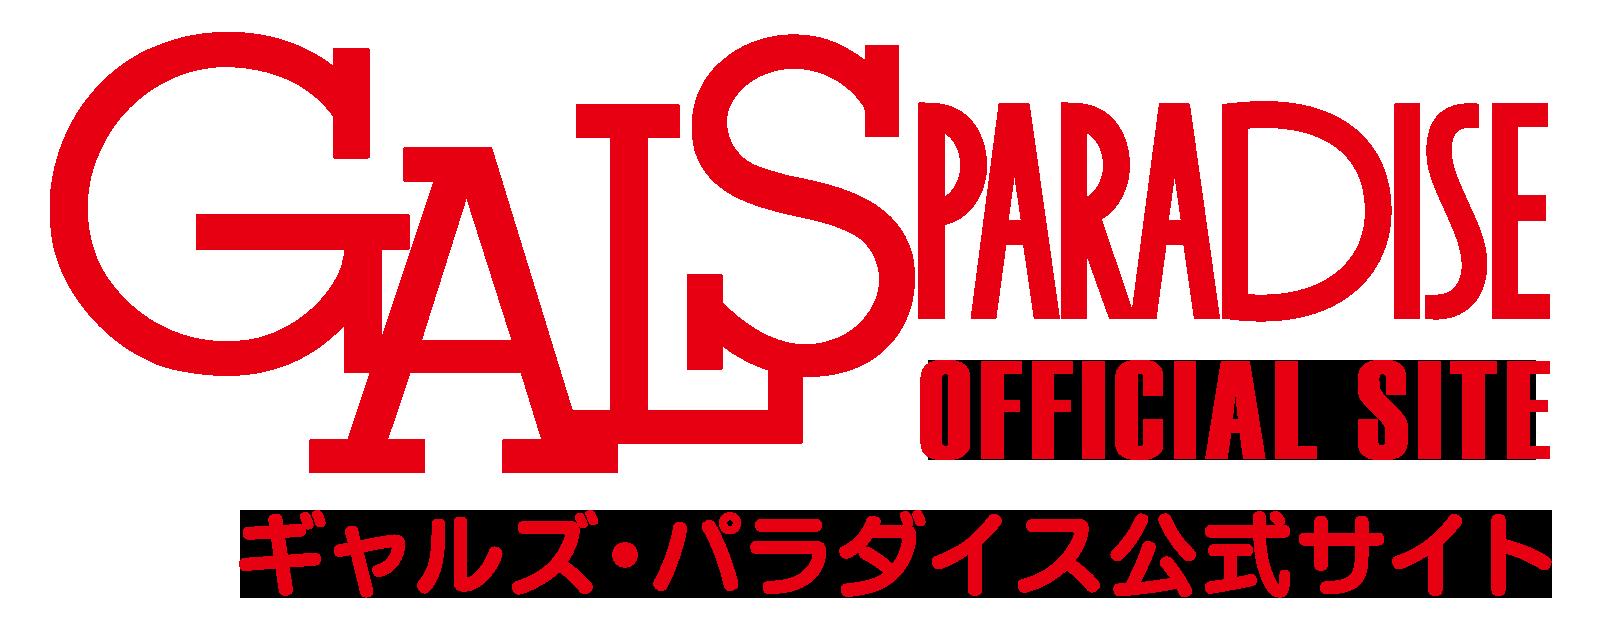 GALSPARADISE ギャルズパラダイス公式サイト